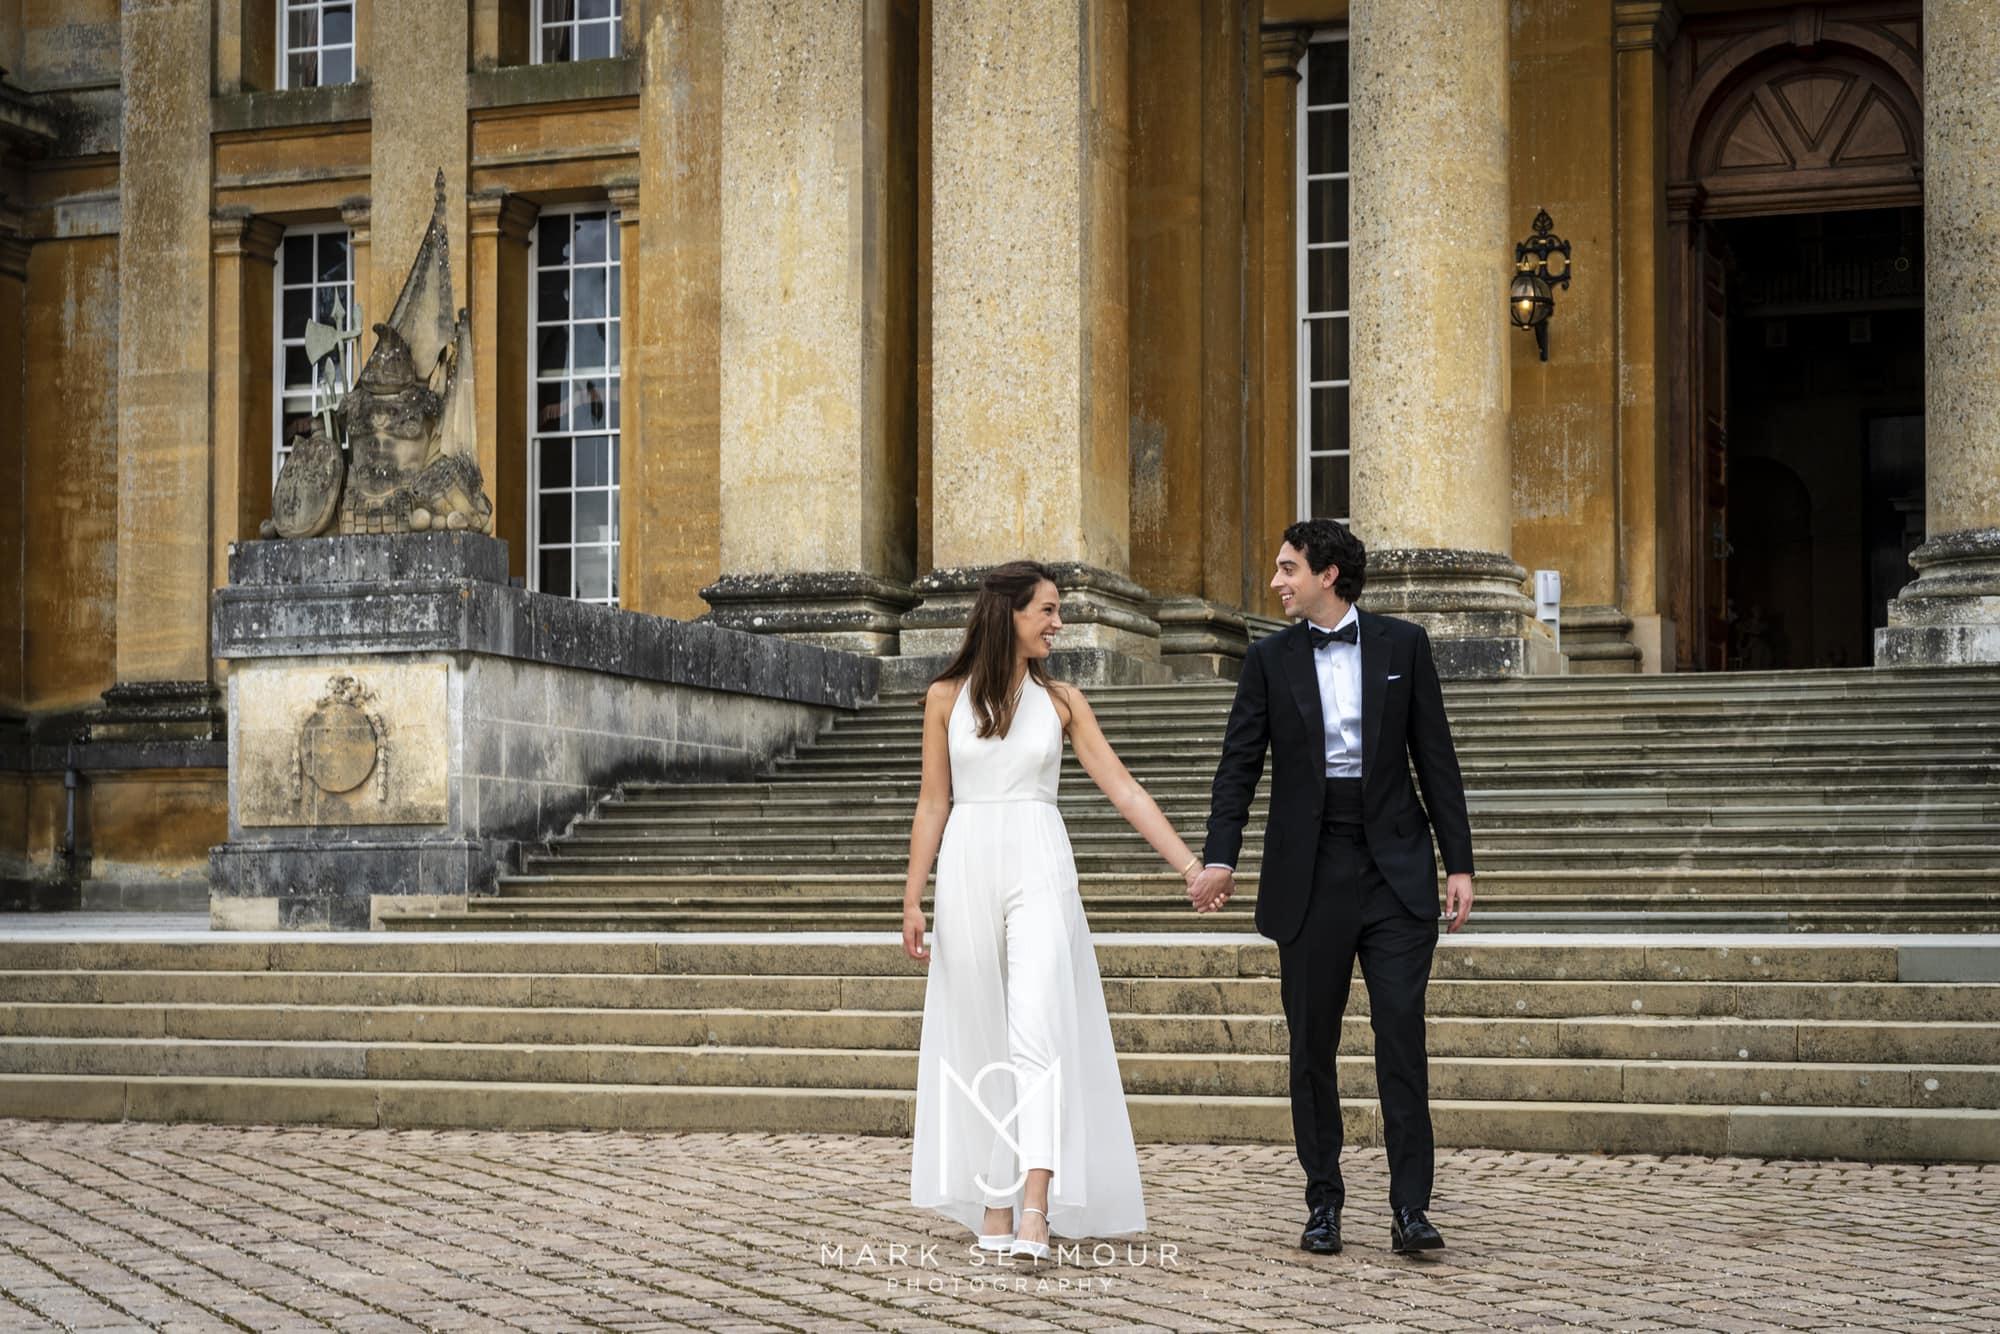 Blenheim Palace Wedding Photographer 2